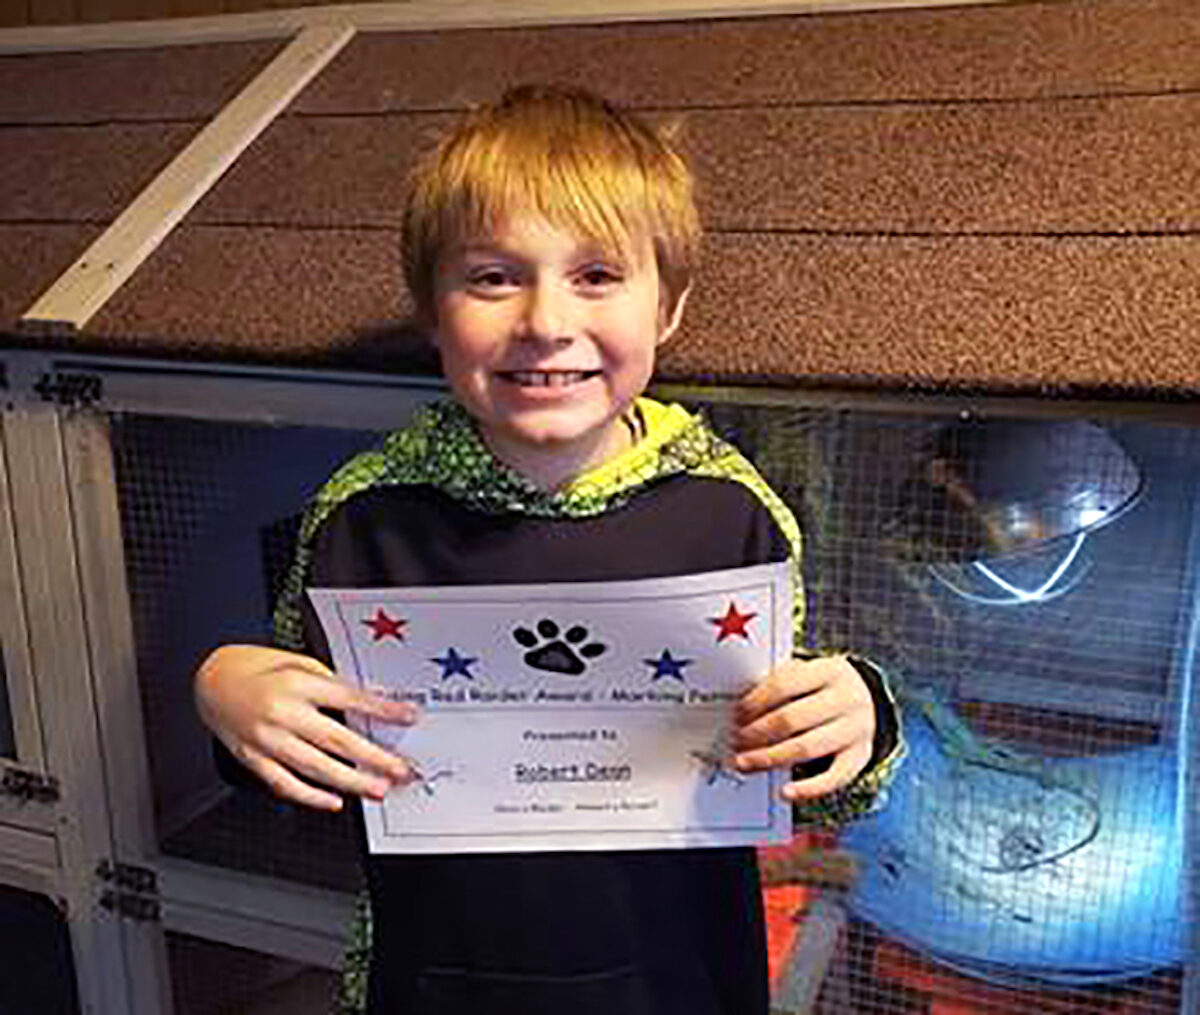 9-year-old Bobby Dean displays an award